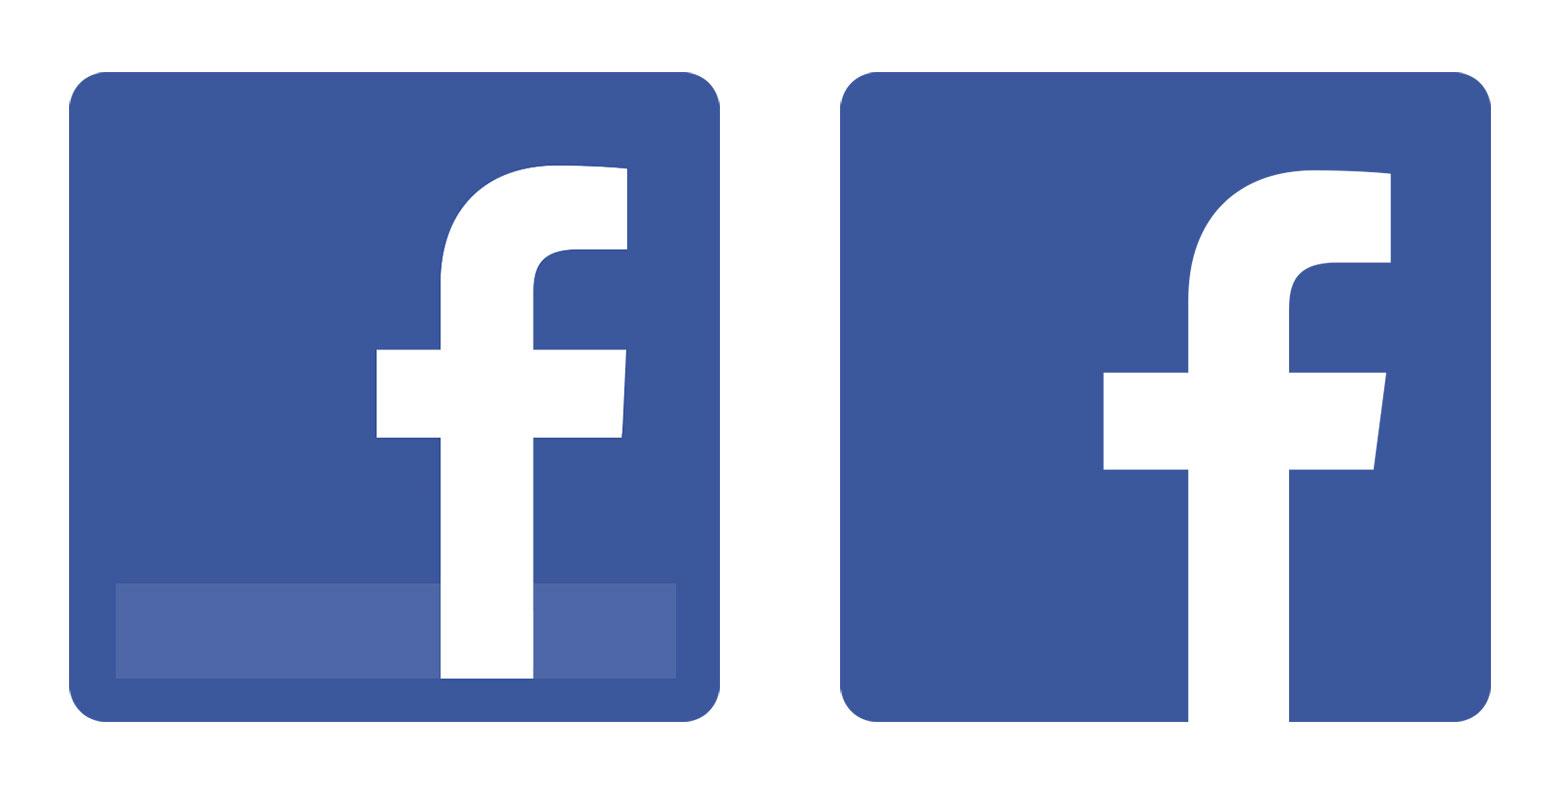 Facebook clip art. Logo clipart free download